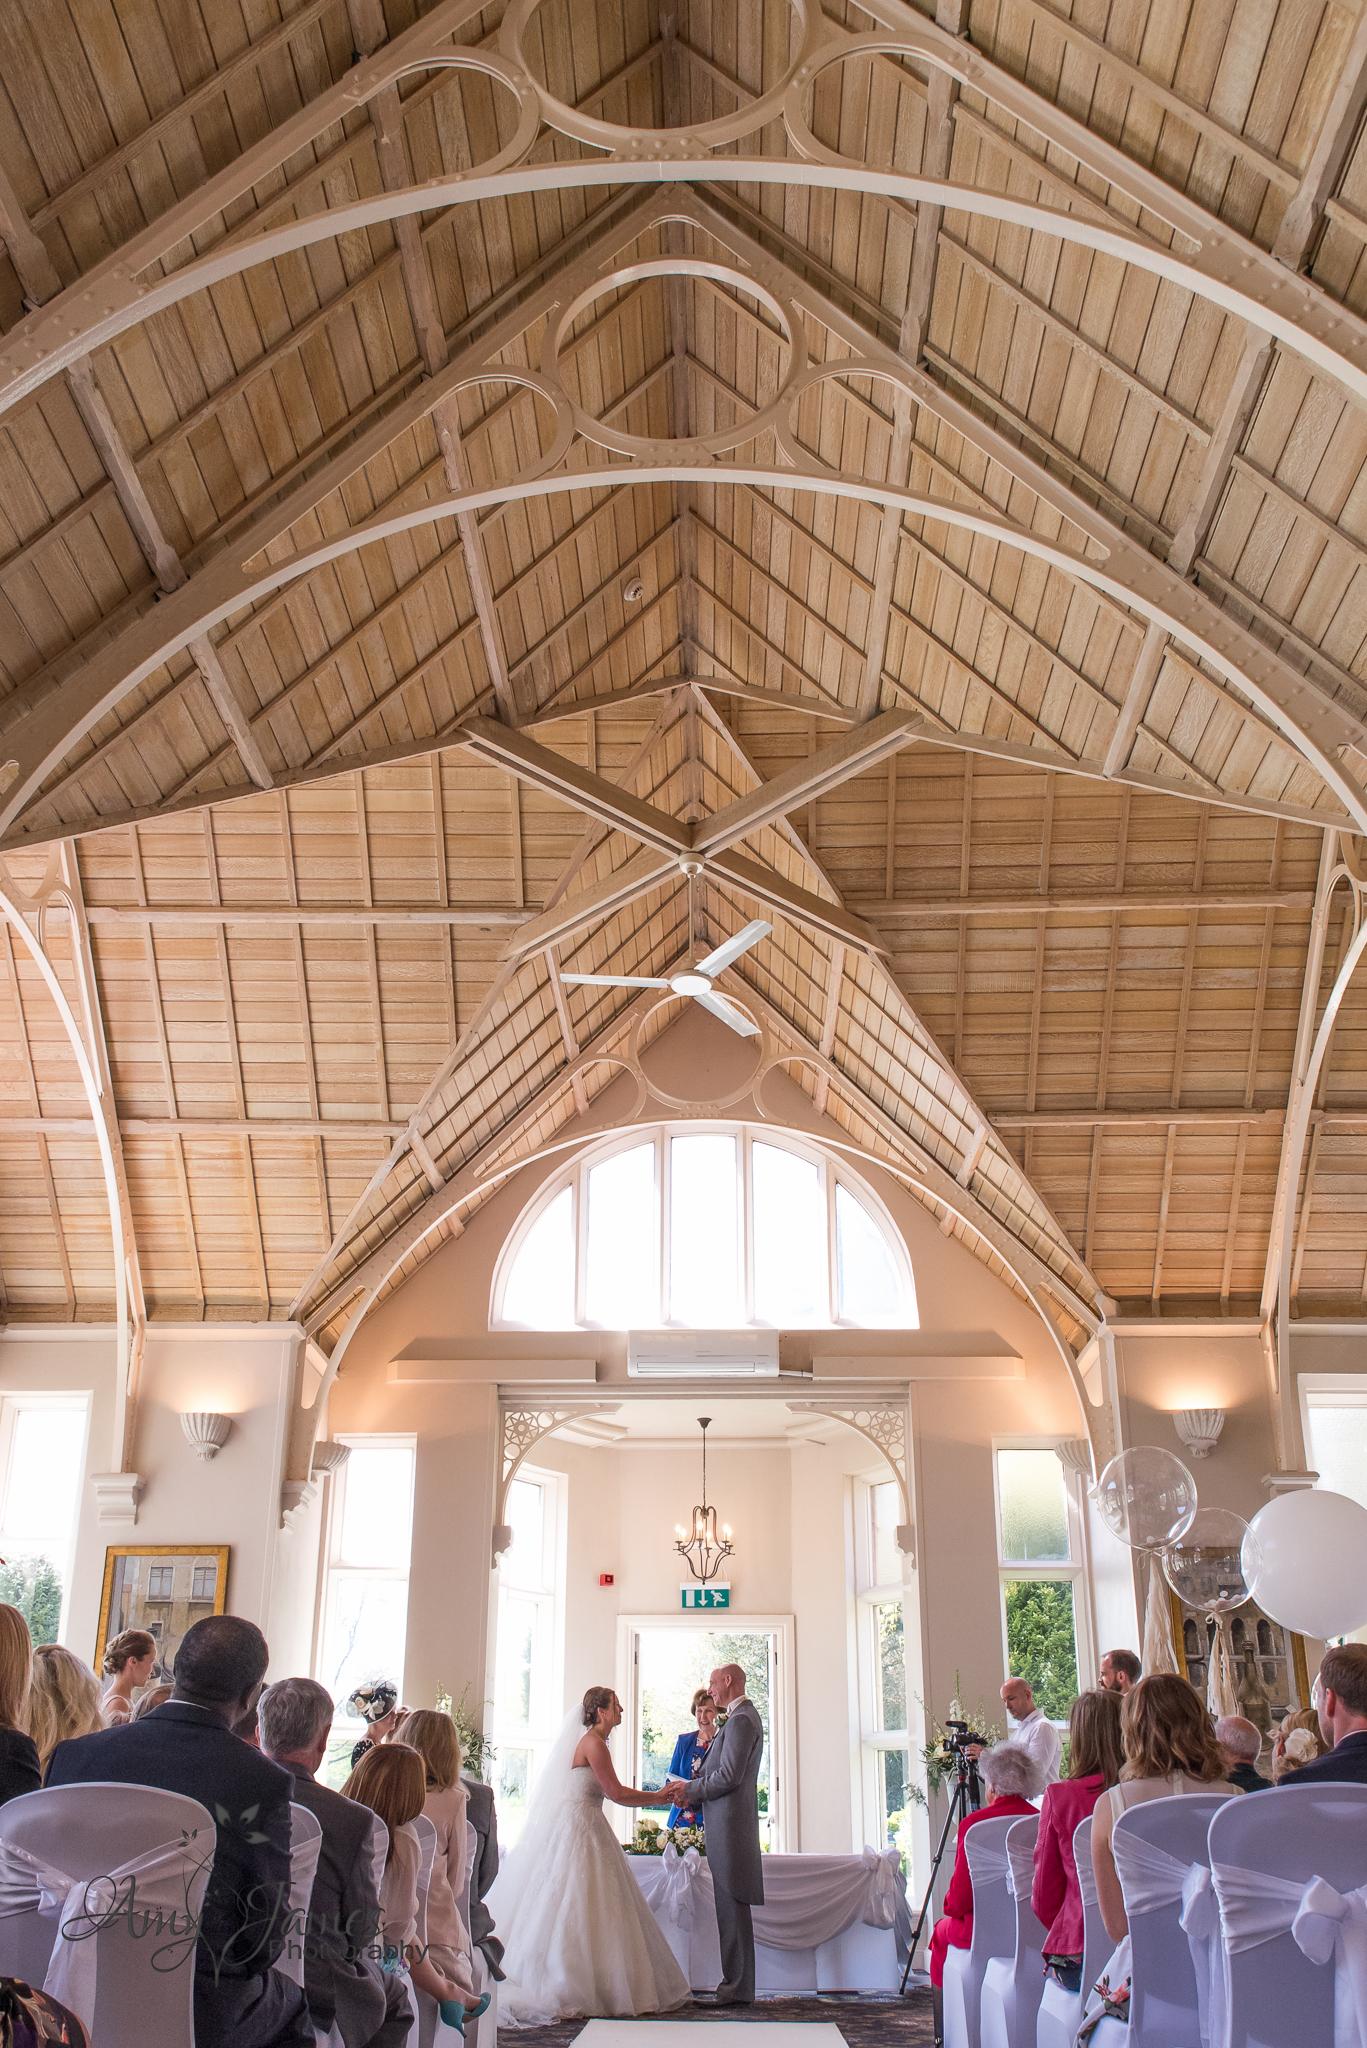 Amy James Photography //Hampshire Wedding Photographer // Hampshire Wedding Venues // Surrey Wedding Venues// Basingstoke Wedding // Audleys Wood Hotel Wedding